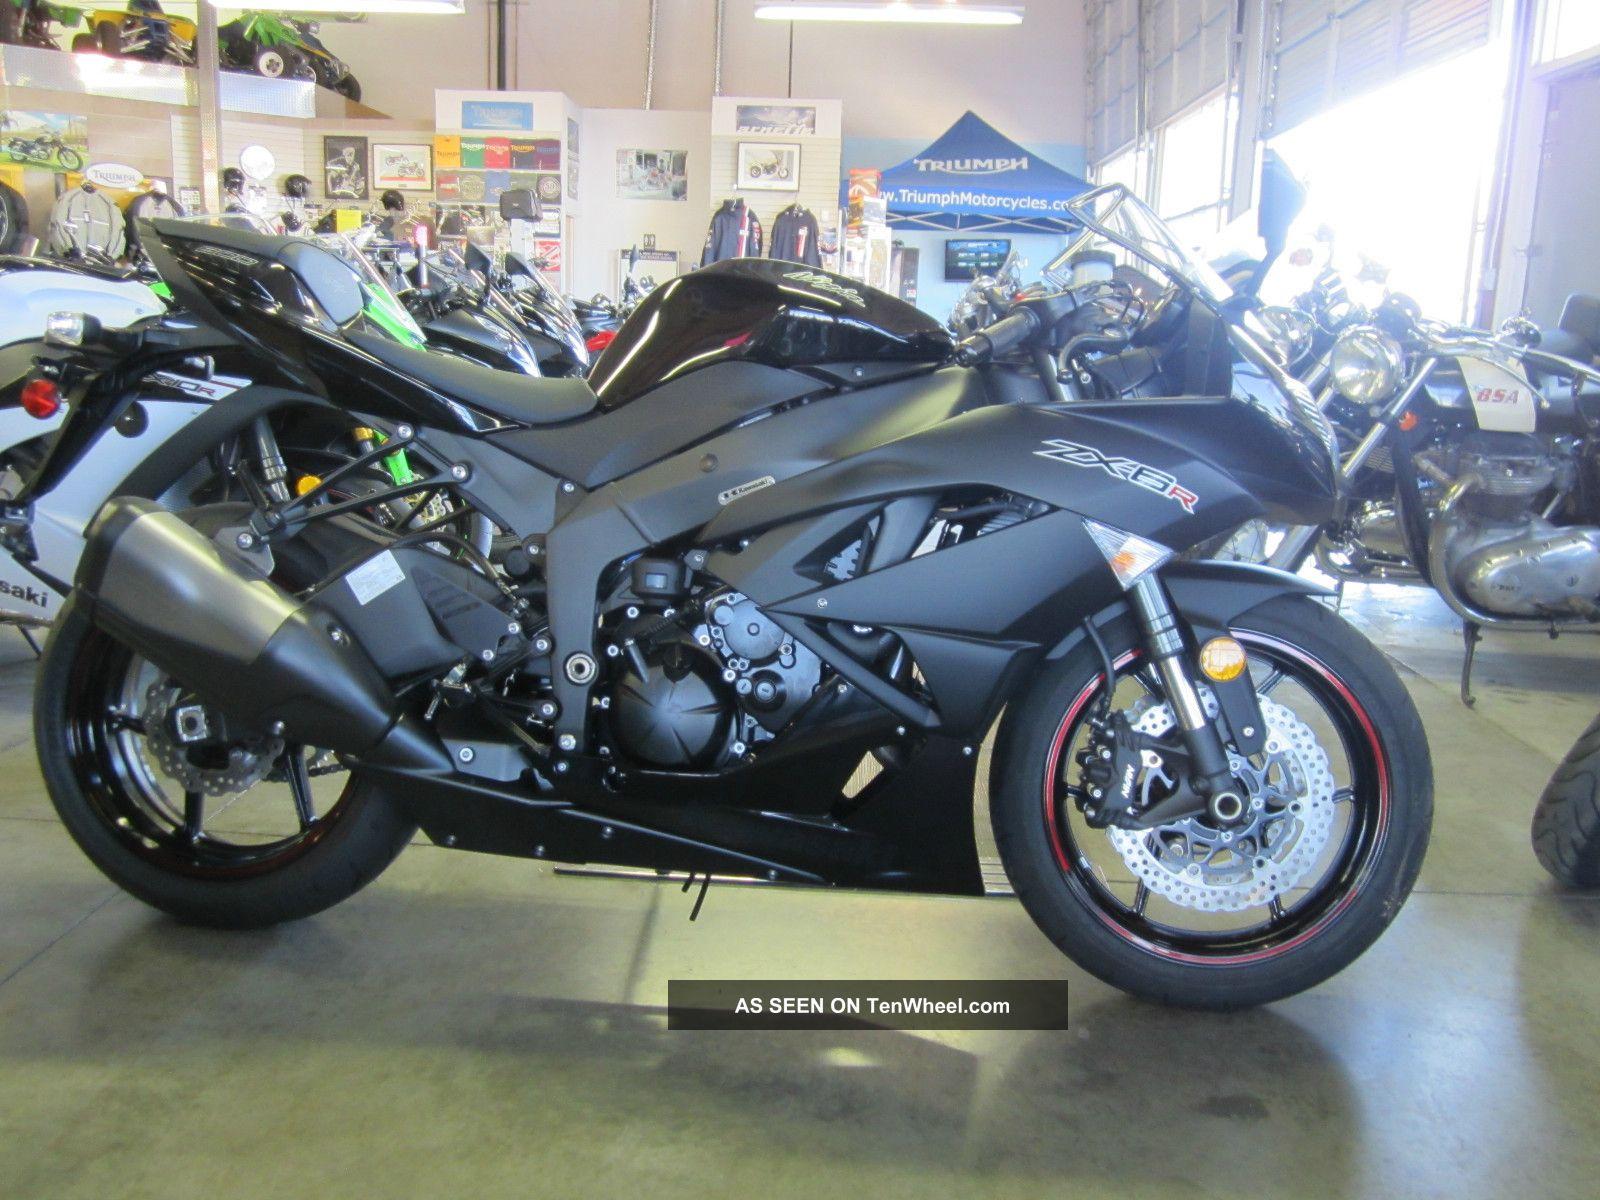 2012 Kawasaki Ninja Zx - 6r In Black Last One Was $10,  299.  00 Now $1.  00 Nr Ninja photo